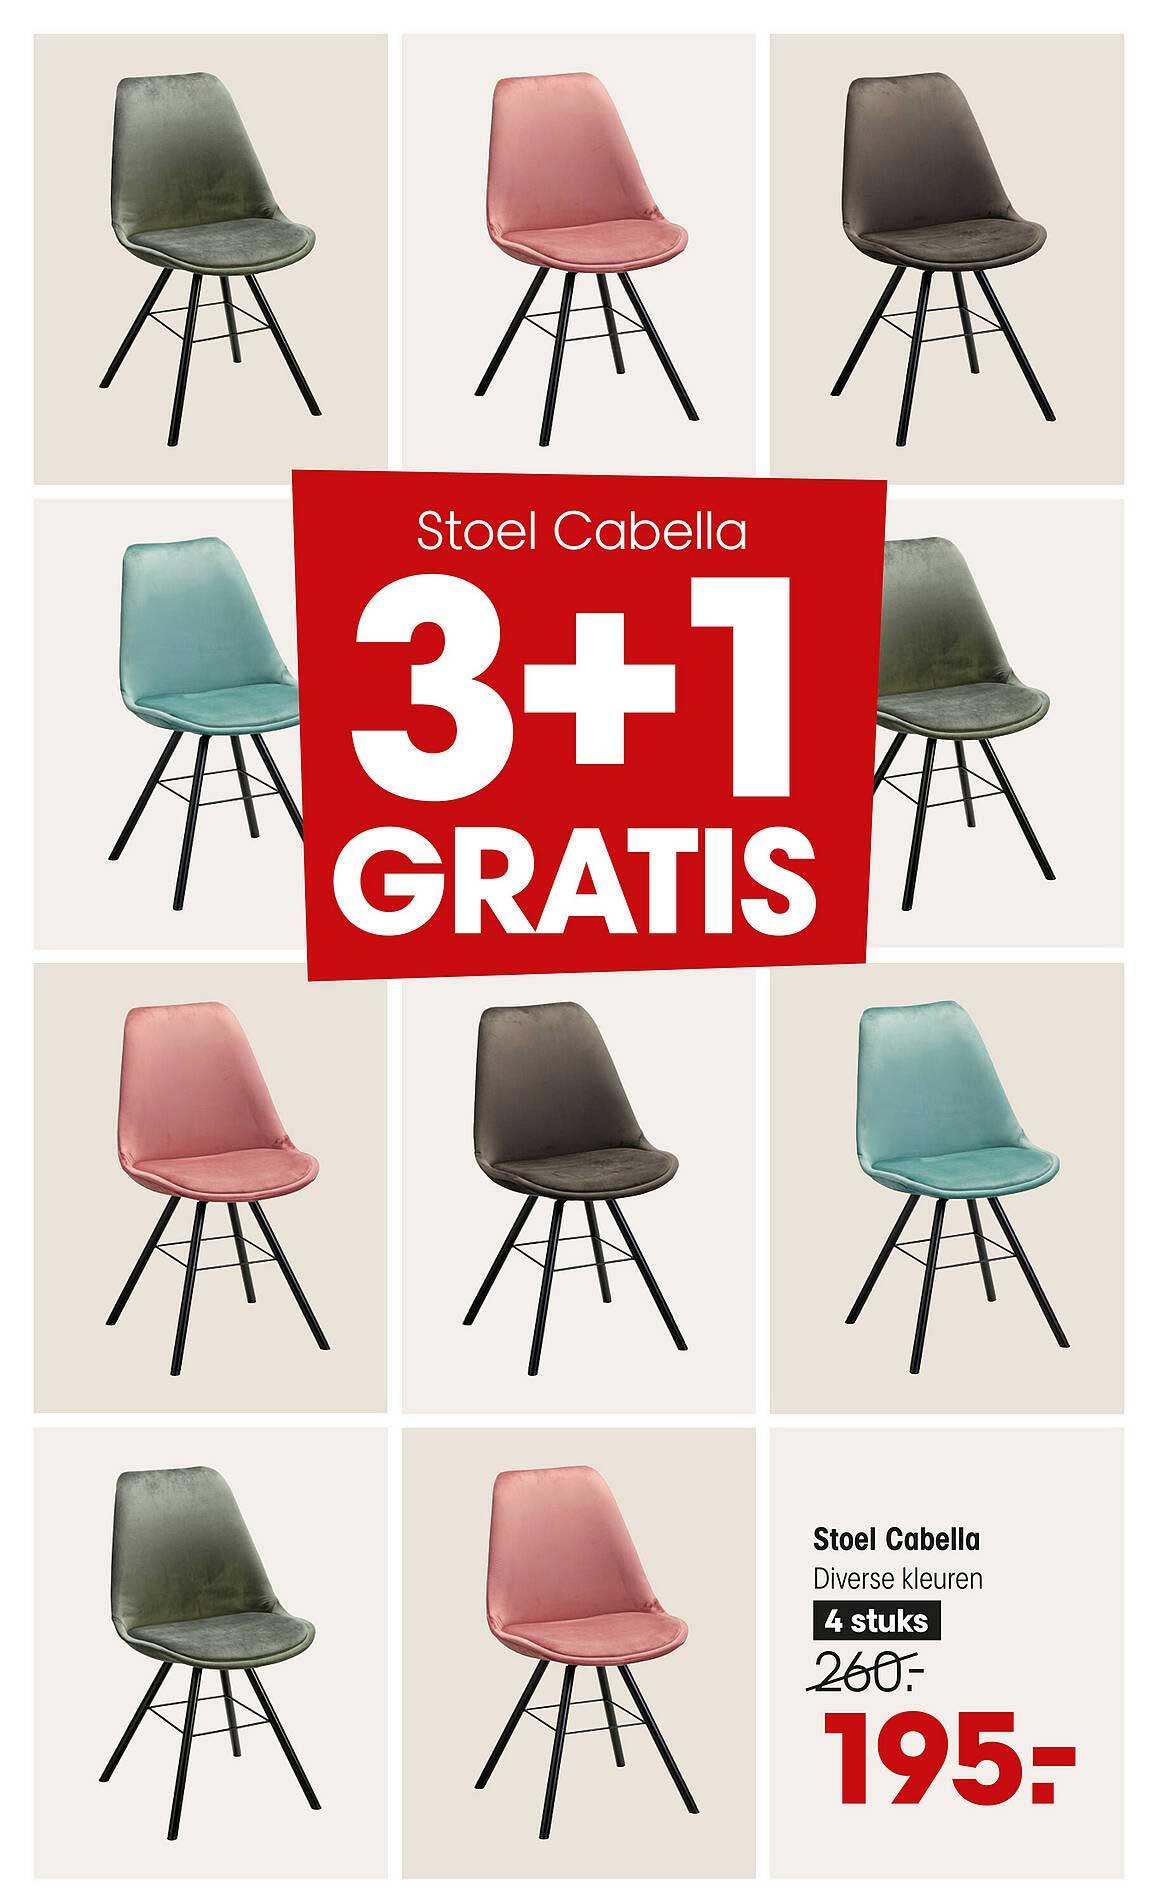 Kwantum Stoel Cabella 3+1 Gratis